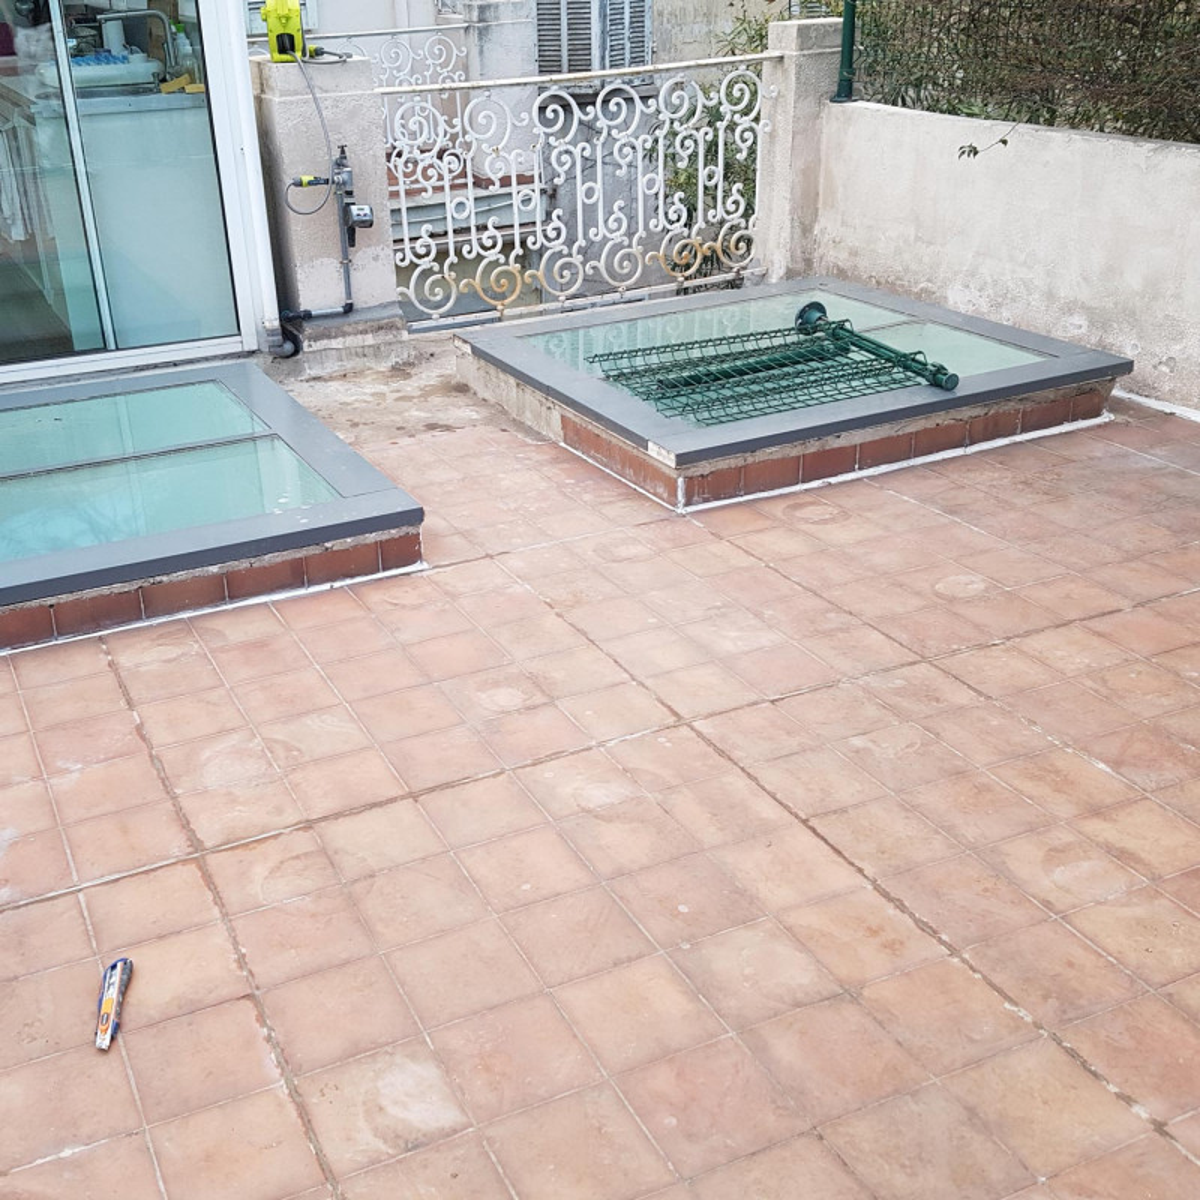 Produit tanch it toit plat terrasse r sine arcathan for Etancheite toit plat